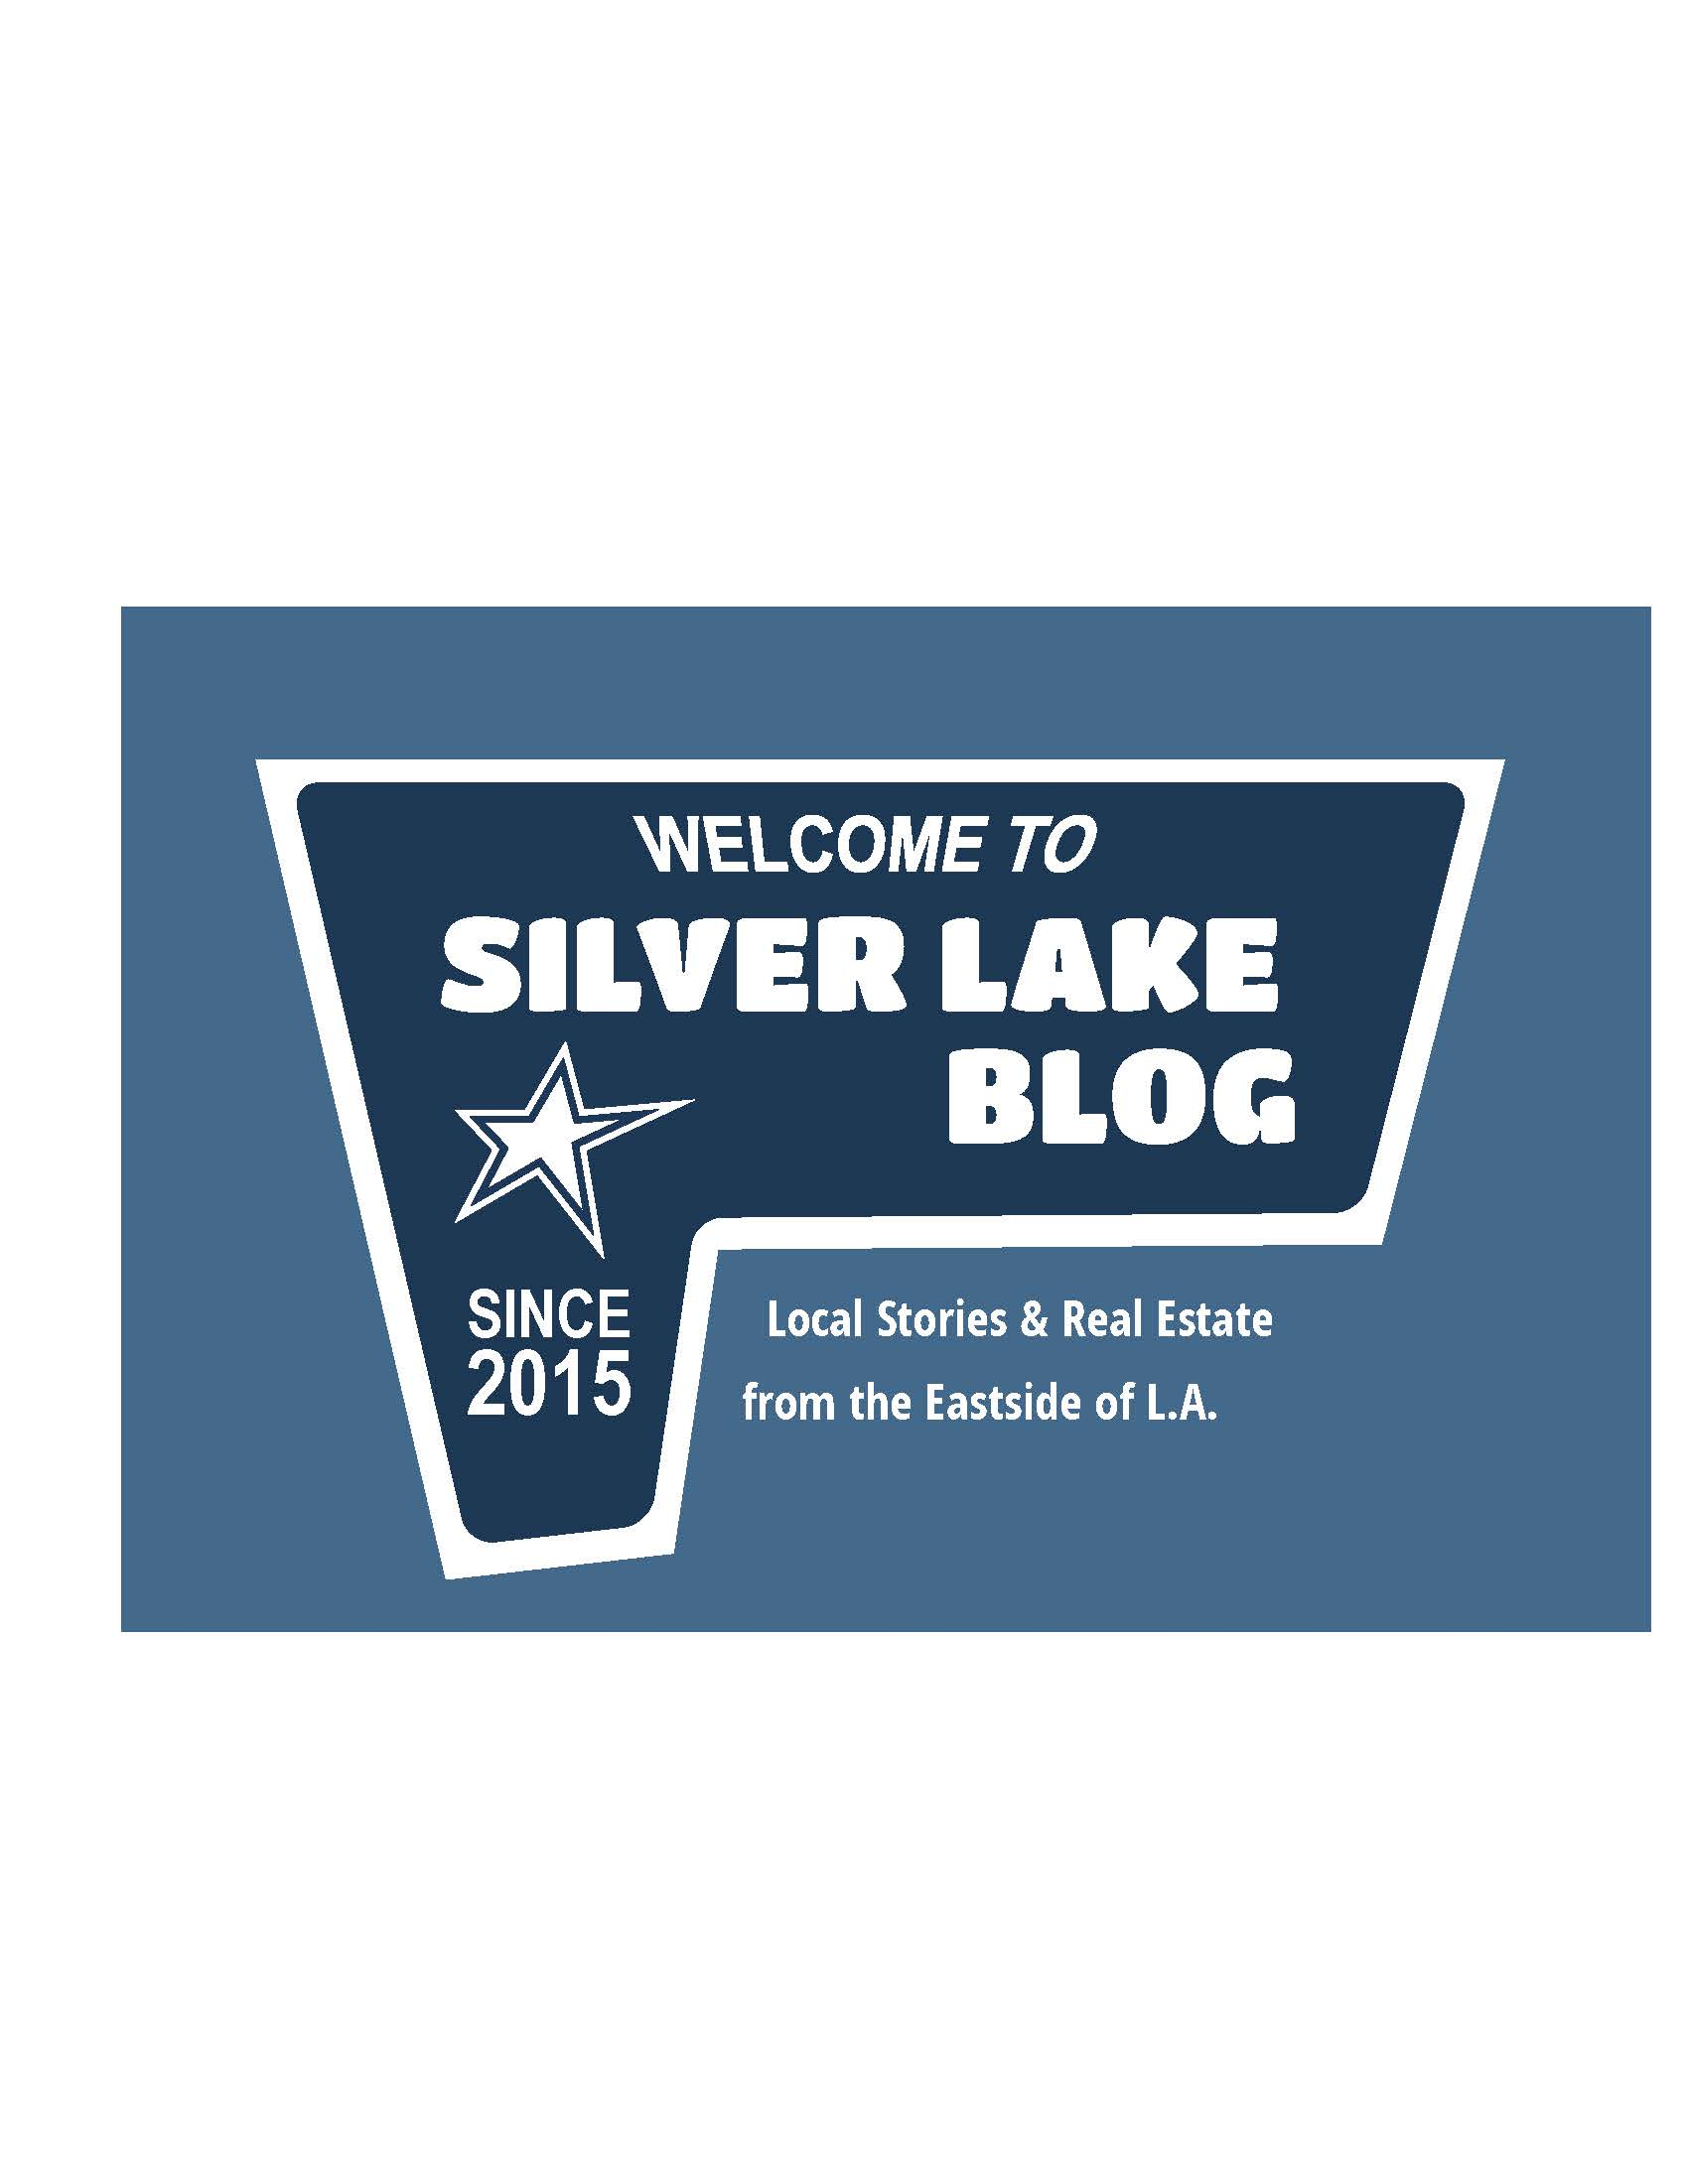 SilverLakeBlog